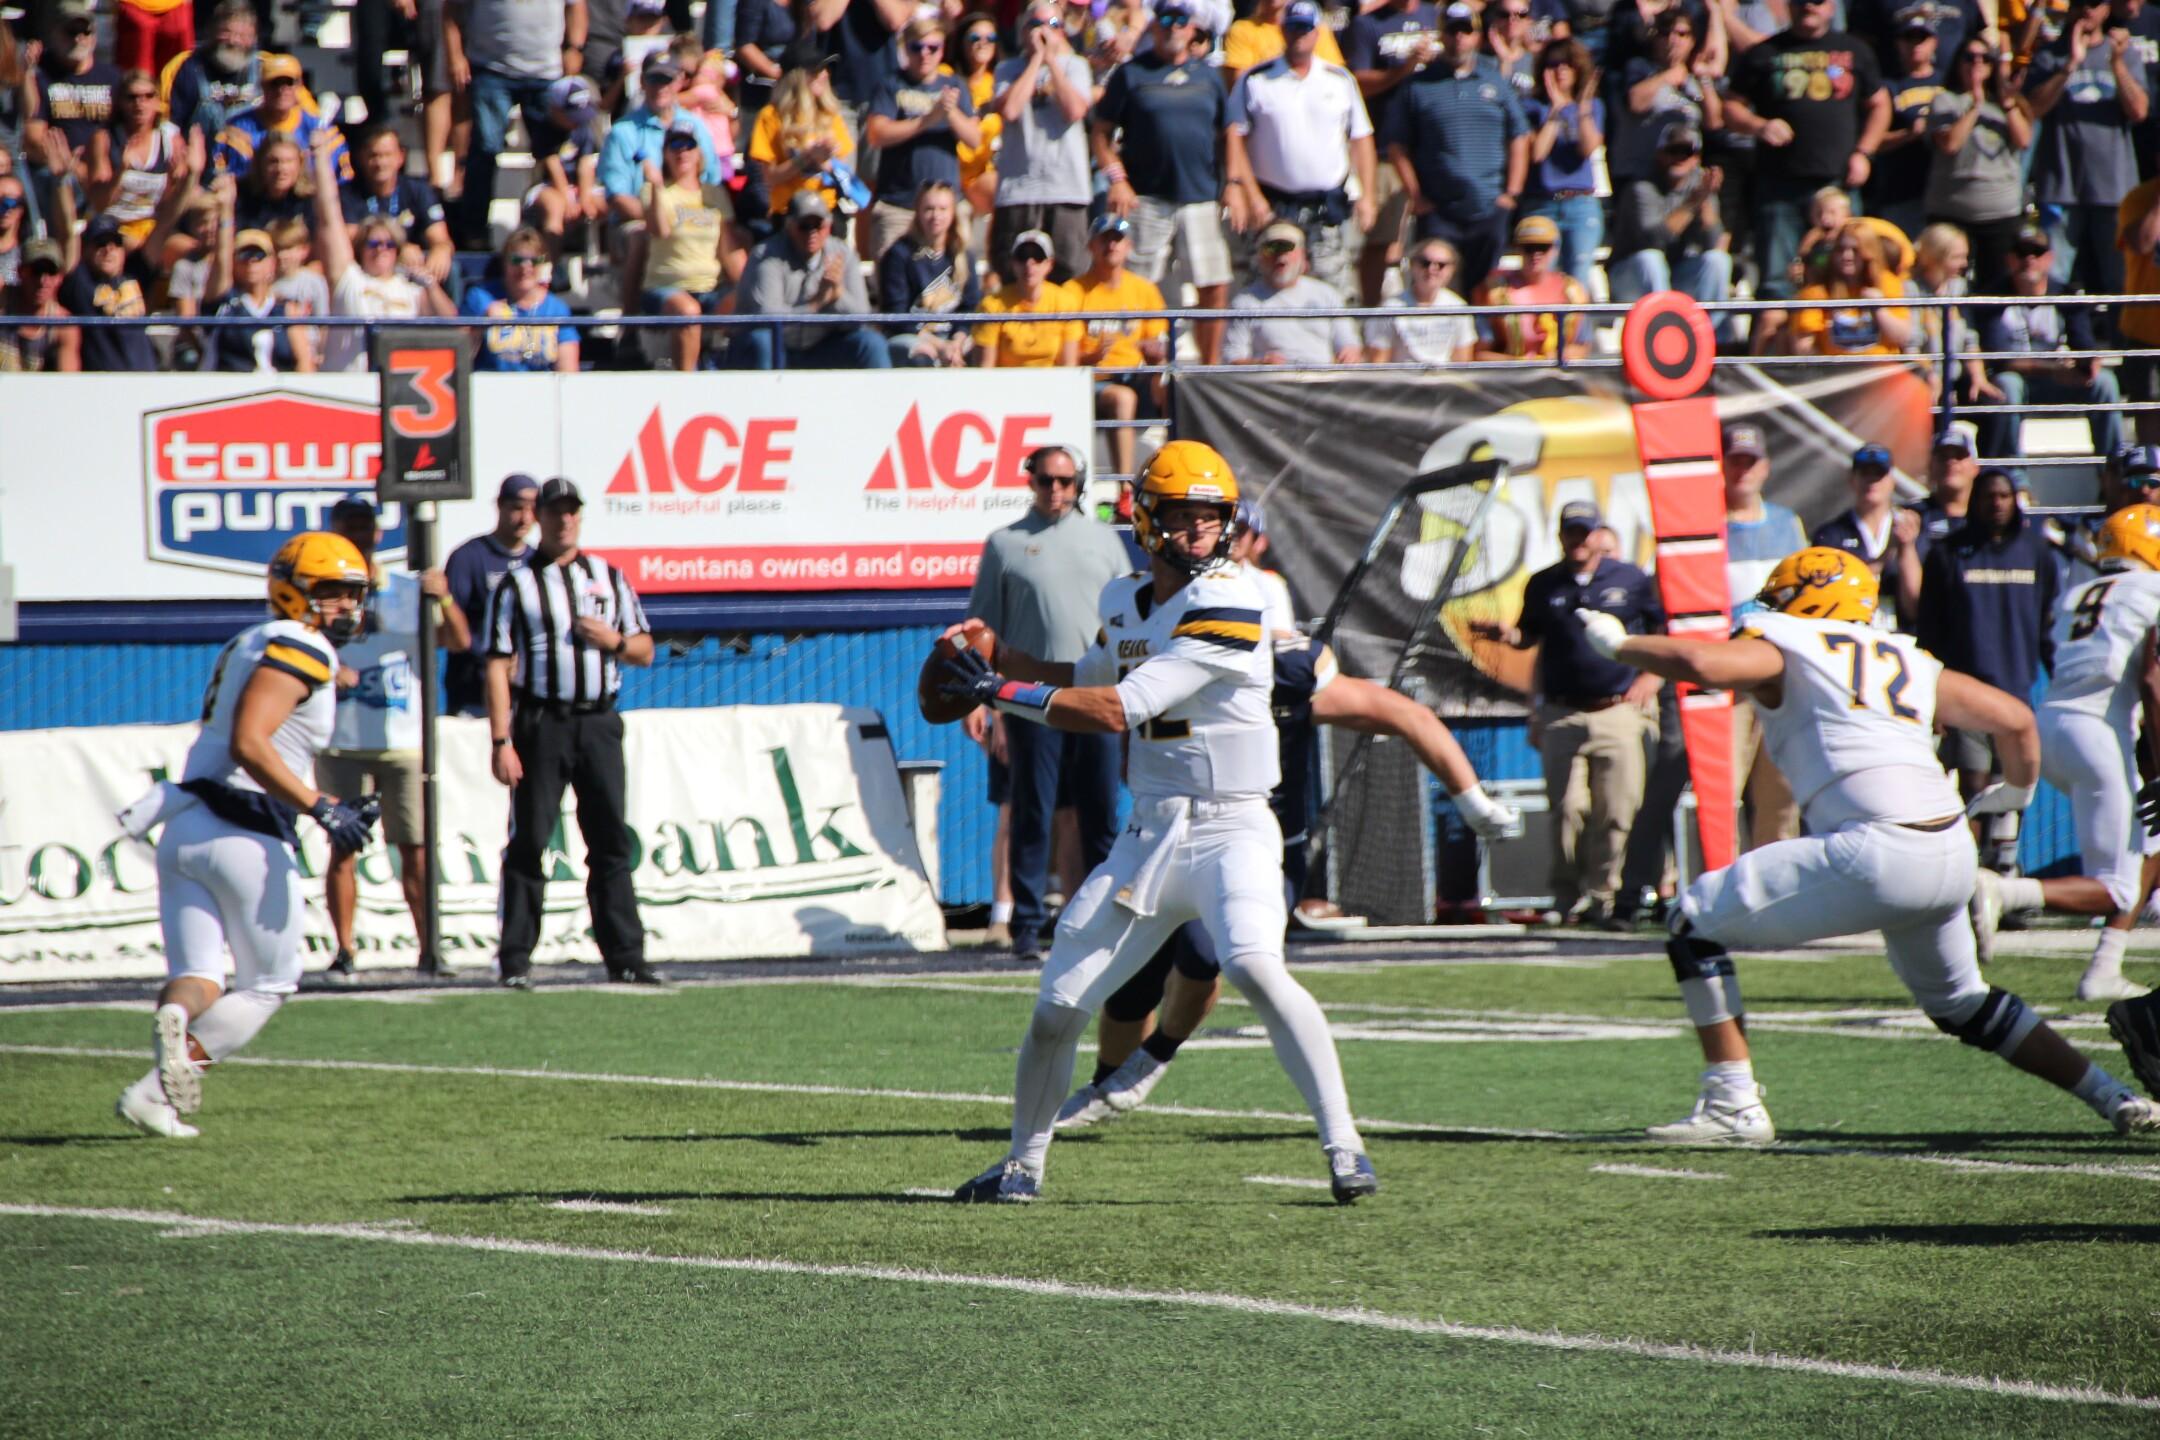 UNC Quarterback Dylan McCaffrey